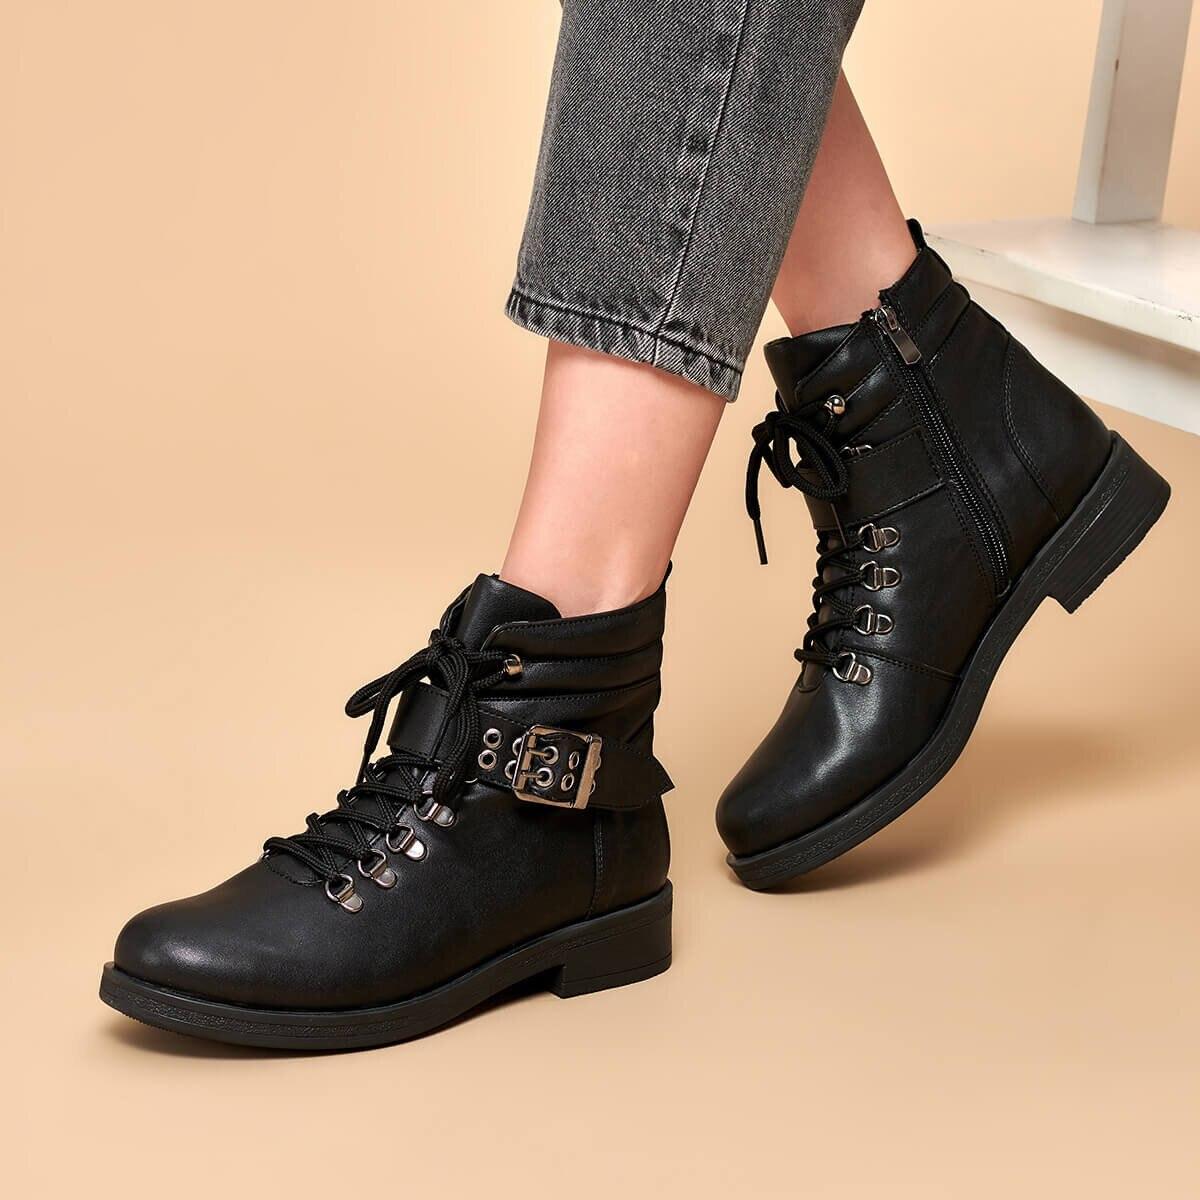 FLO 19K-178 Black Women Boots BUTIGO